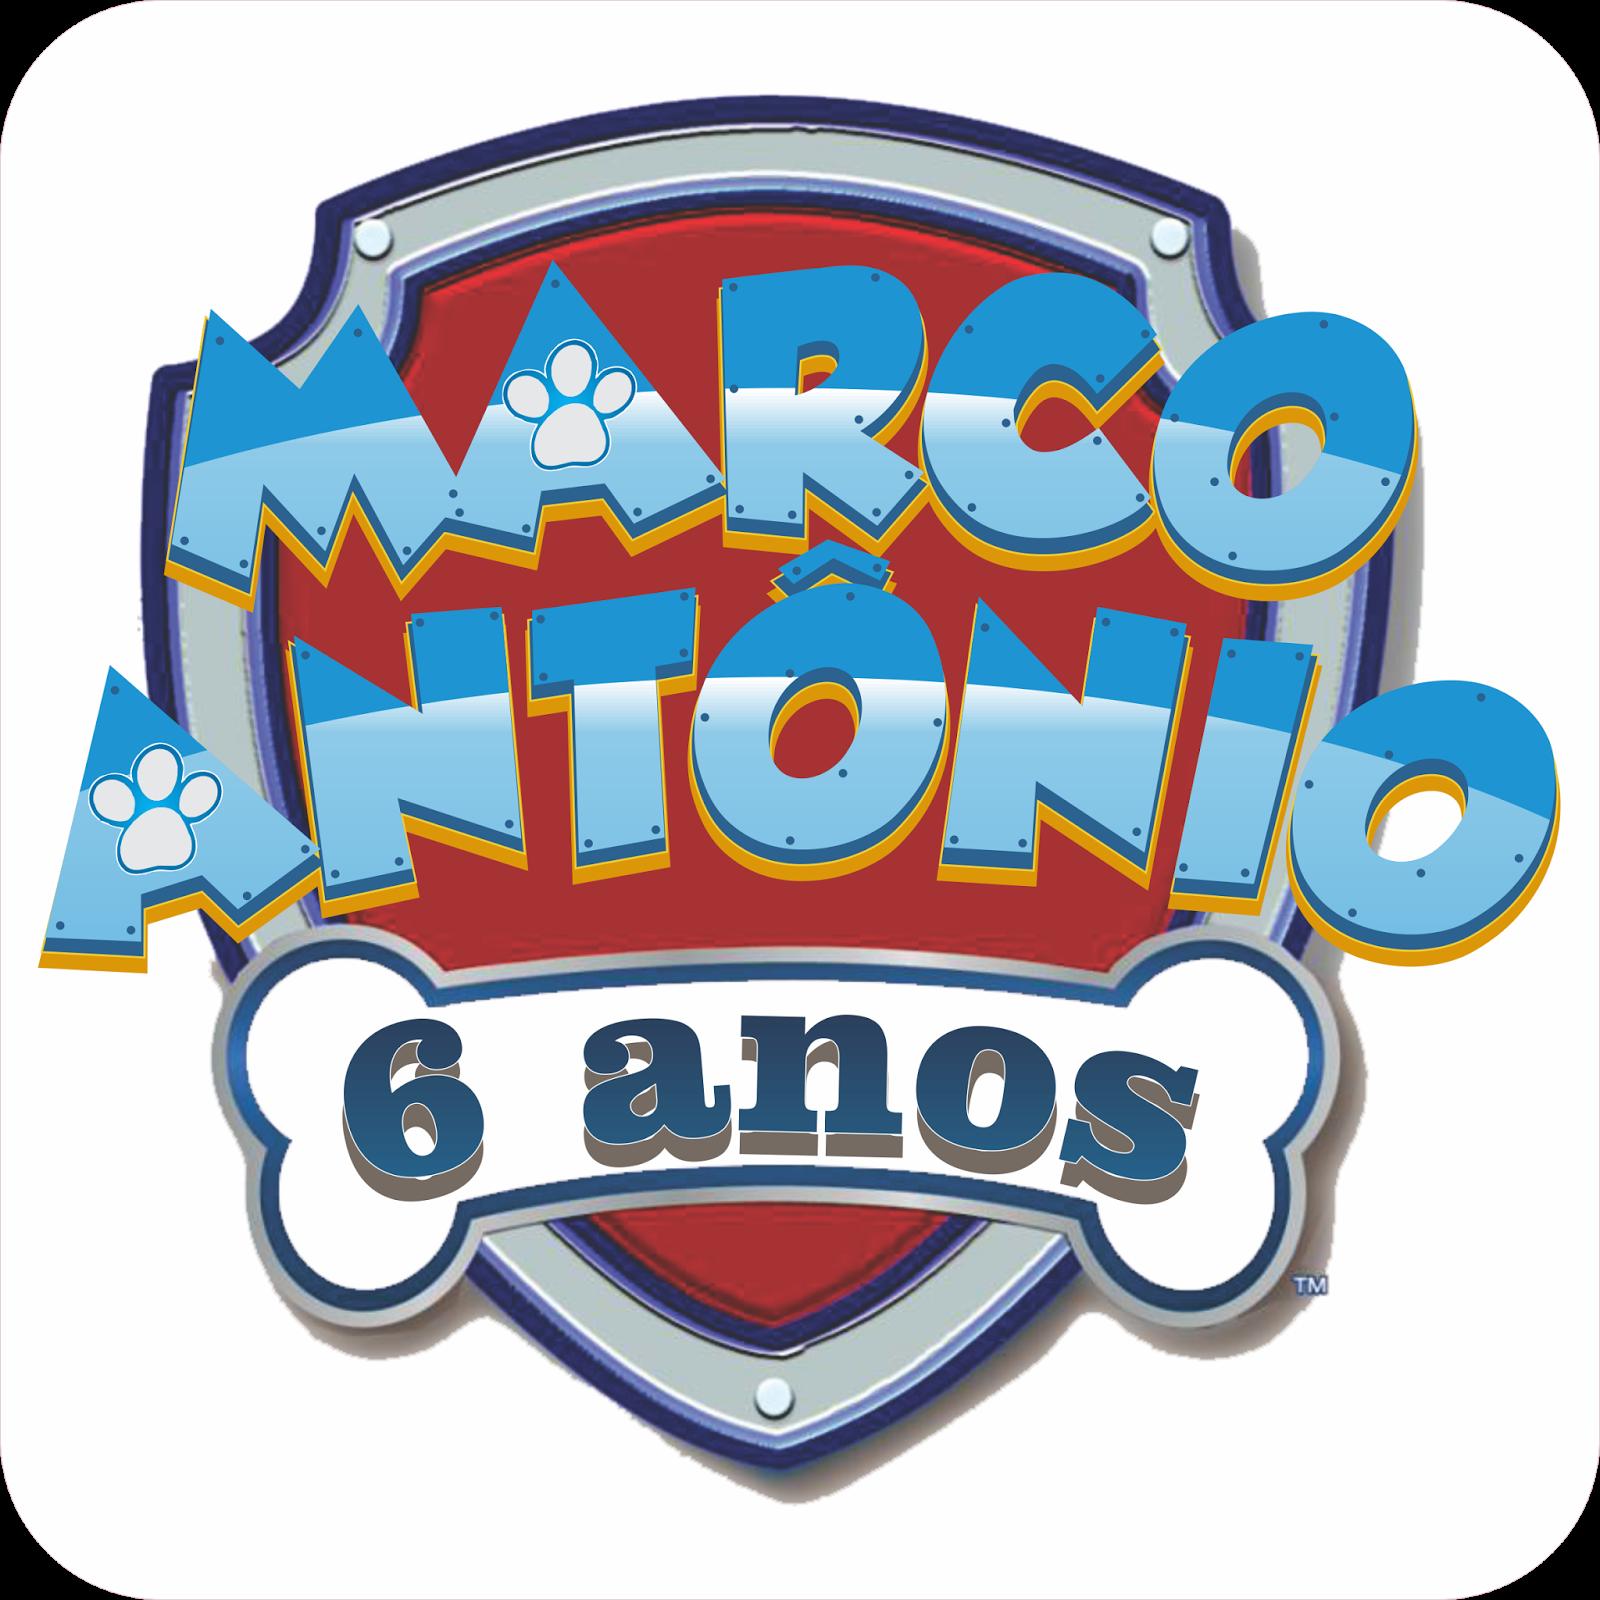 https://fruipartis.blogspot.com.br/2017/03/patrulha-canina-marco-antonio.html